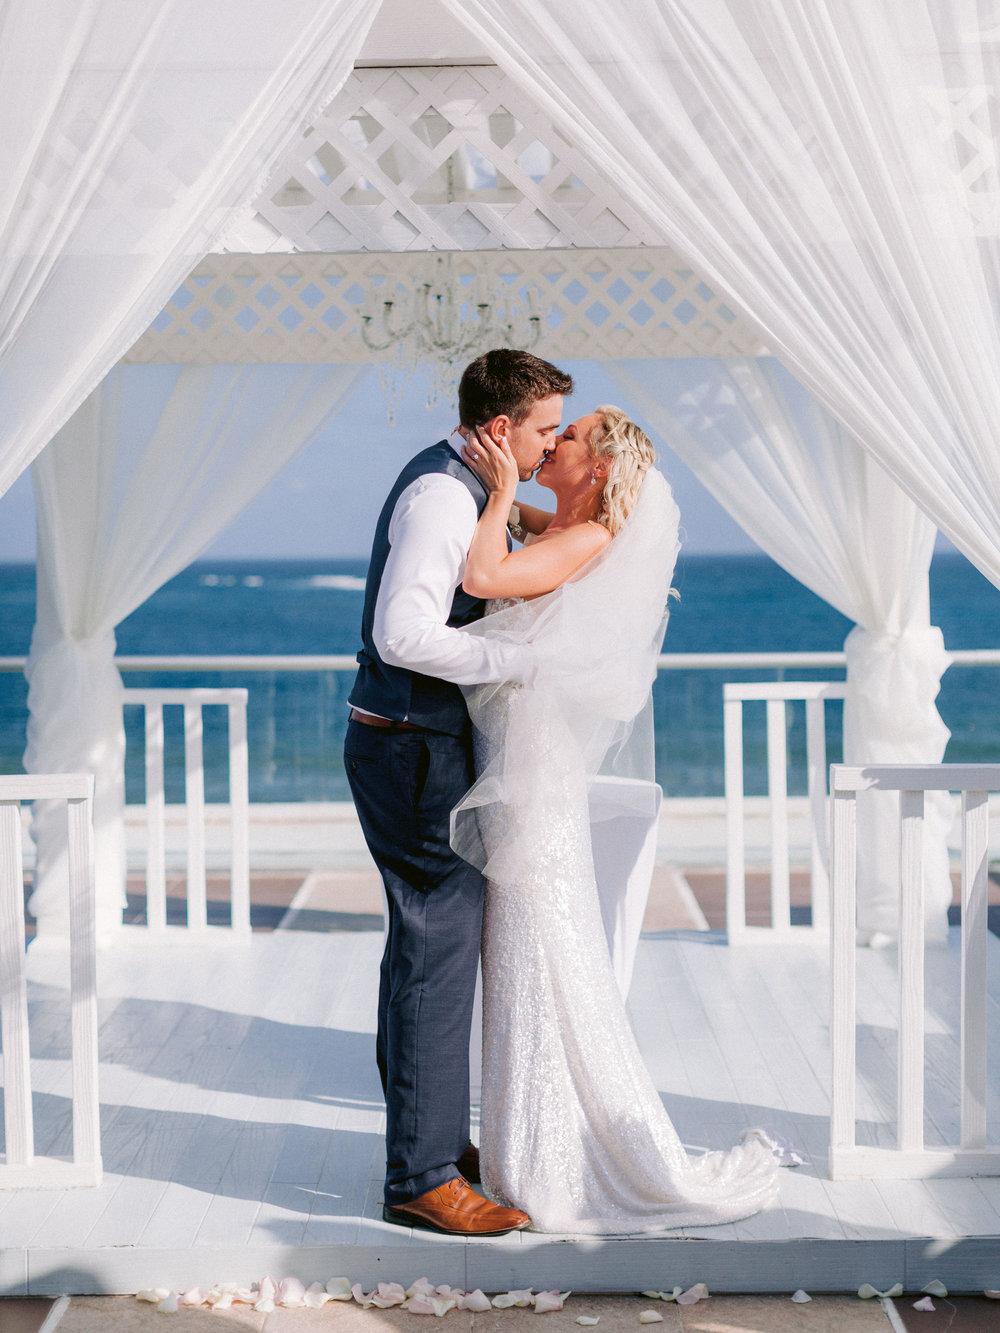 Kim_Jeff_Cancun Wedding_Ceremony_Kurtz_Orpia (99 of 119).jpg